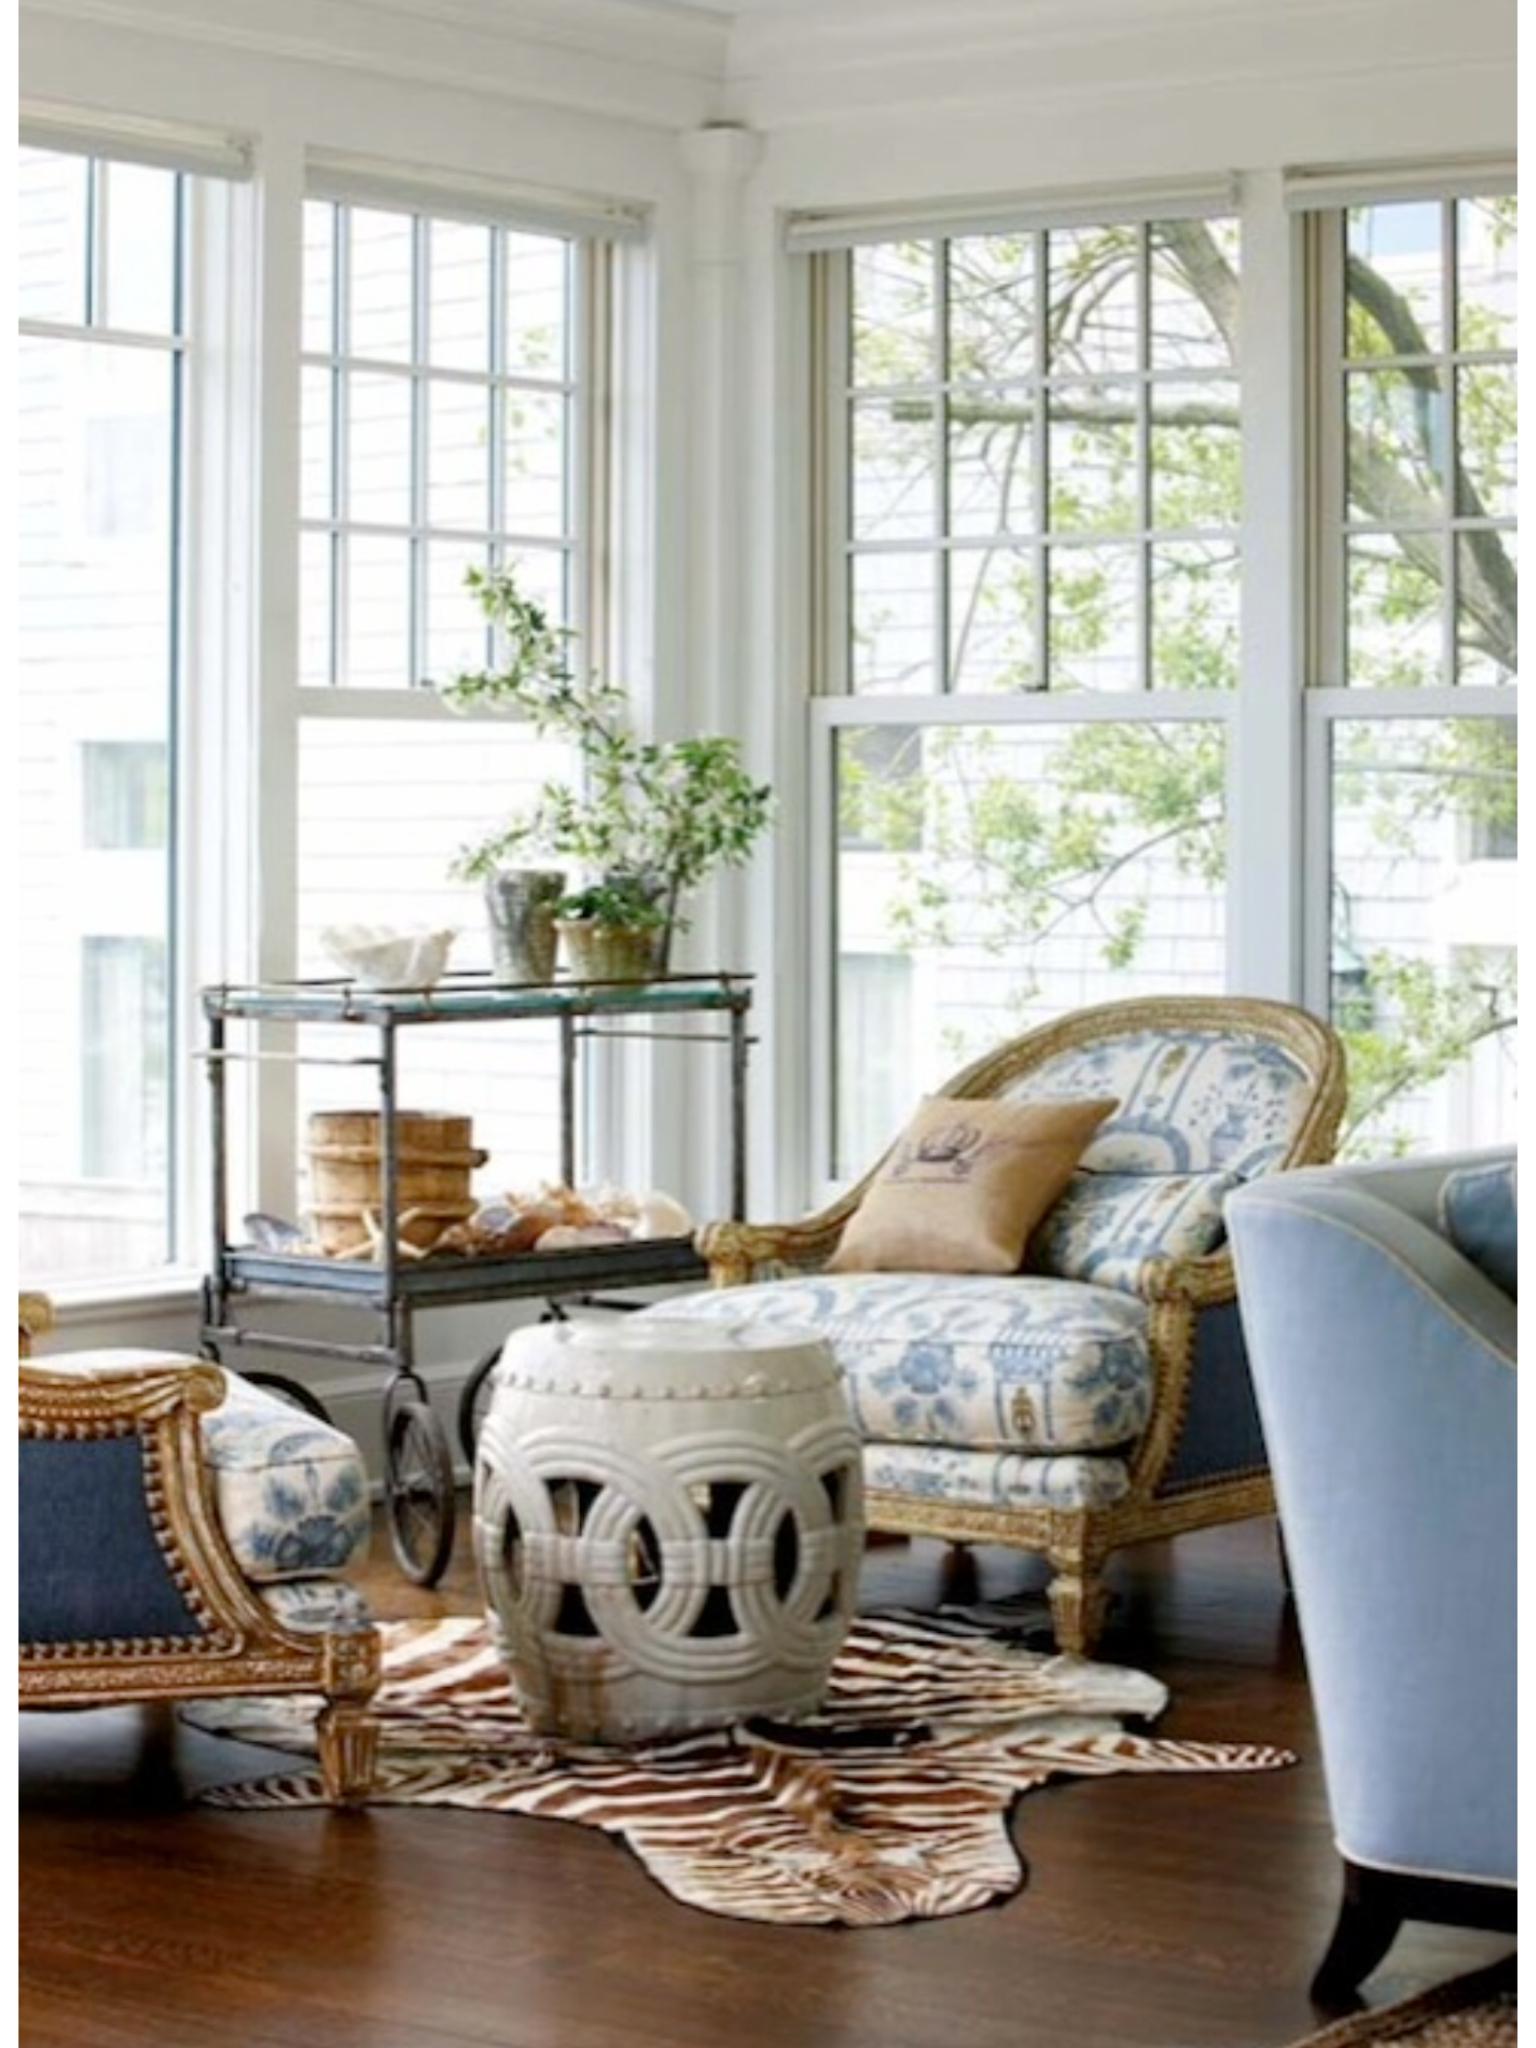 Blue And White Garden Stool